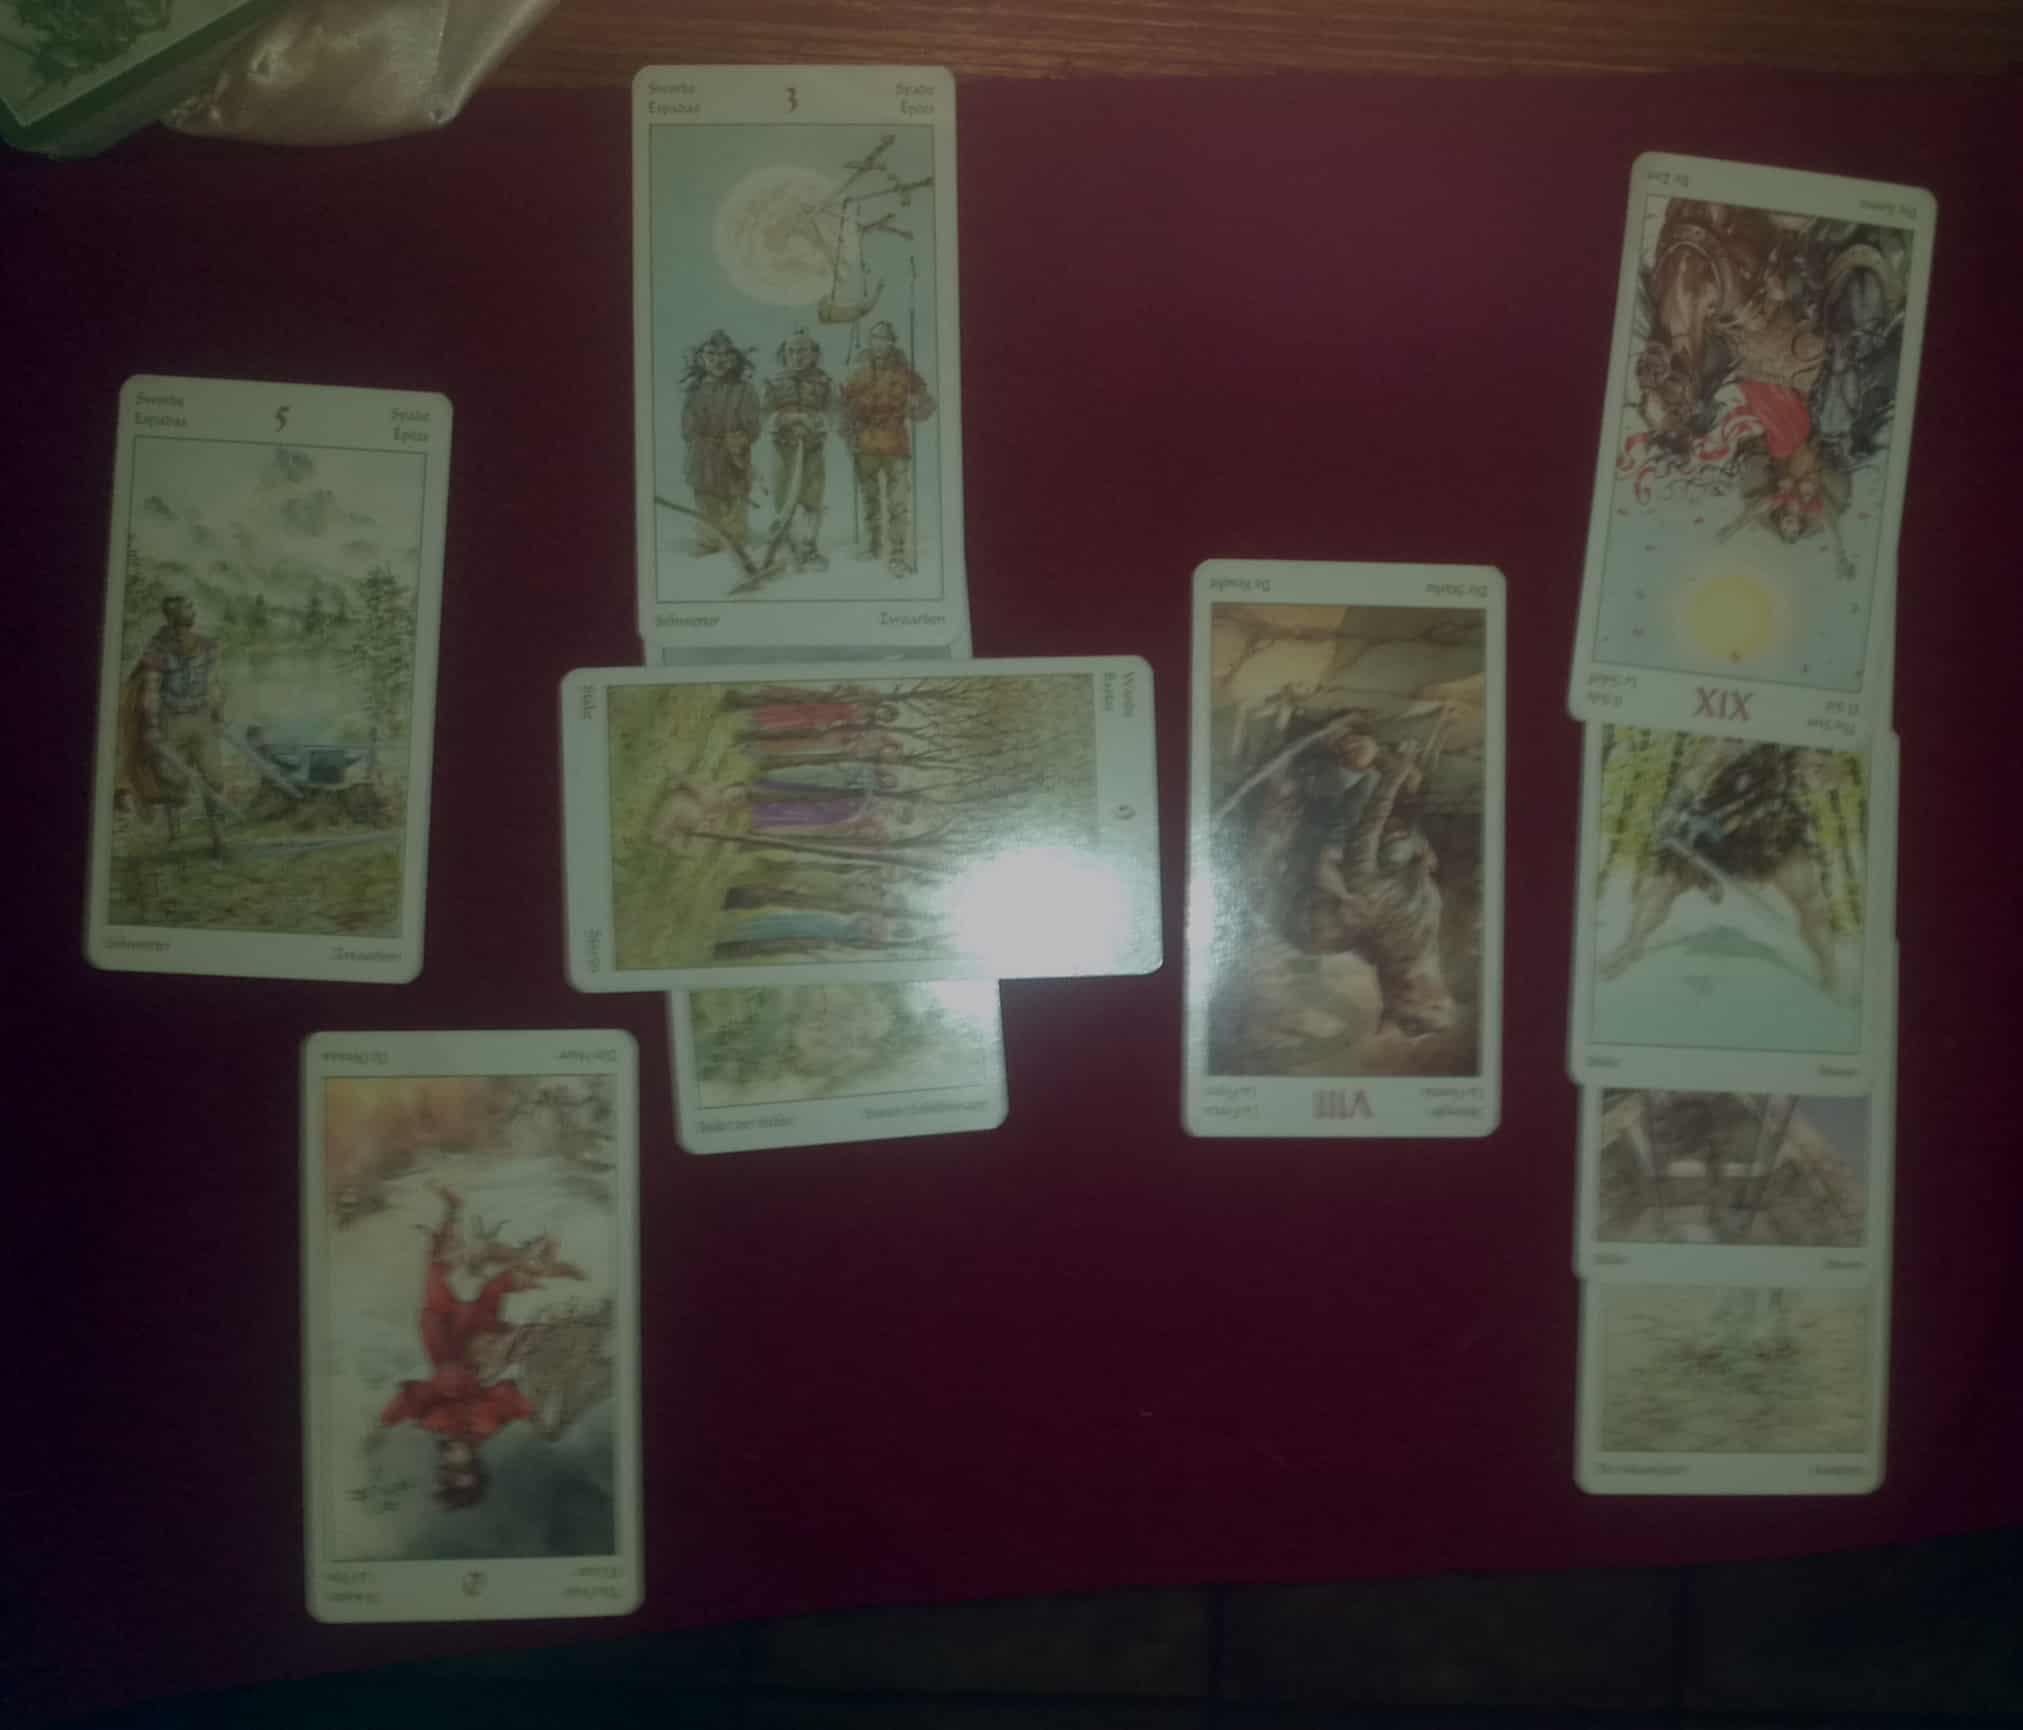 A business success Tarot reading